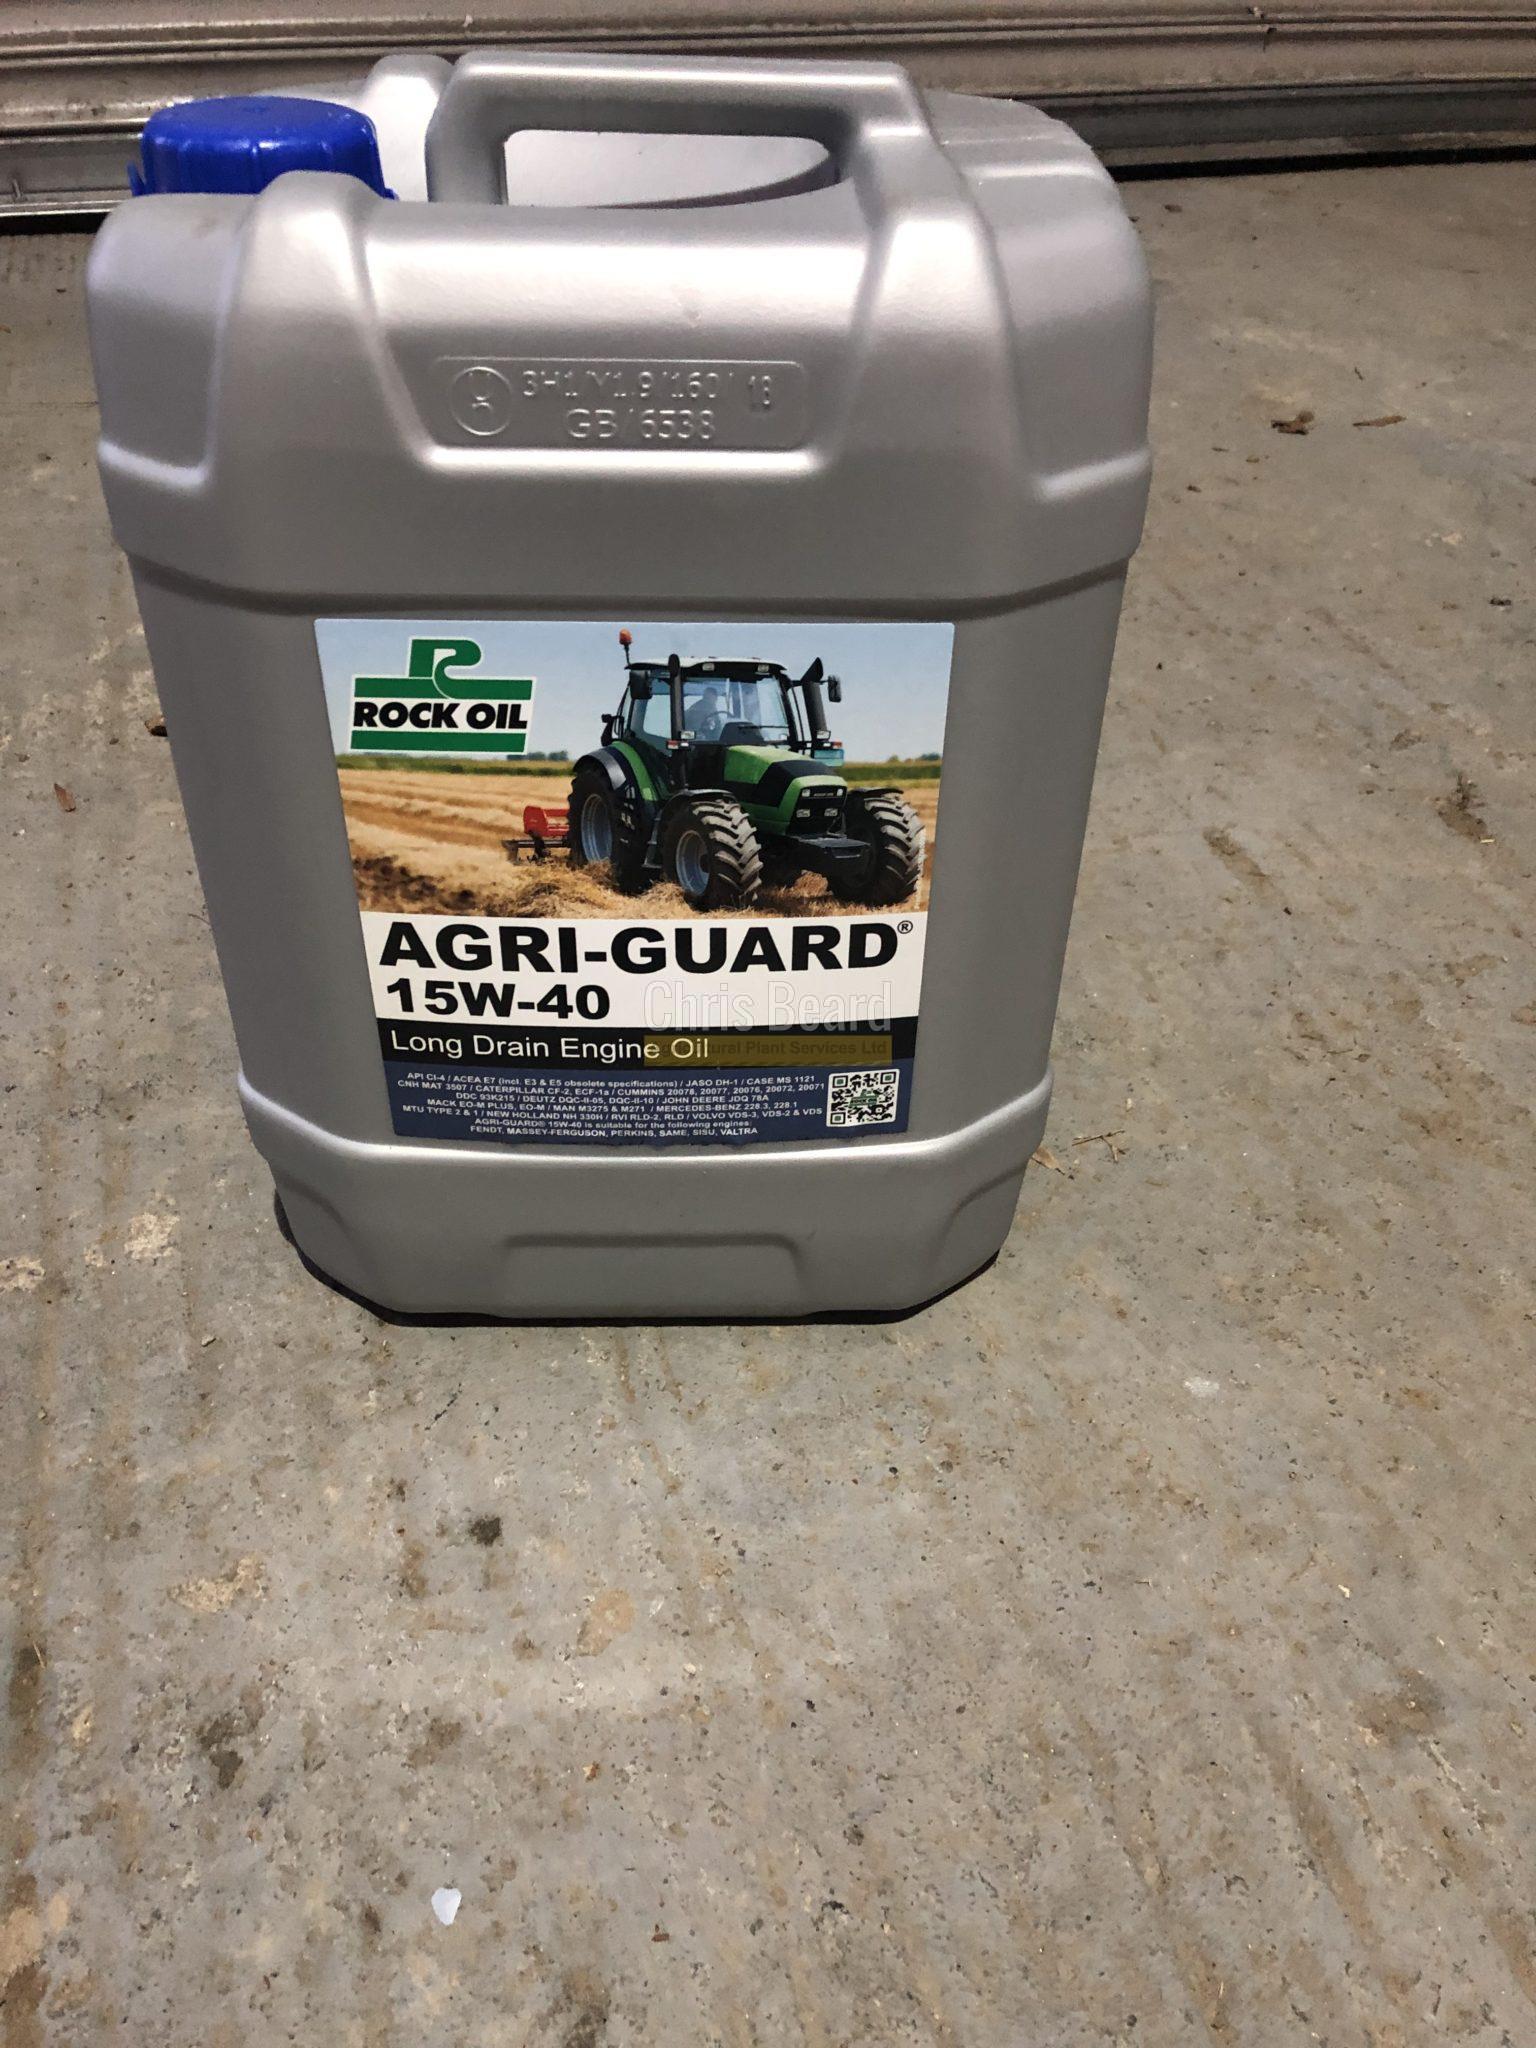 Rock Oil Agri-Guard 15W 40 Engine Oil